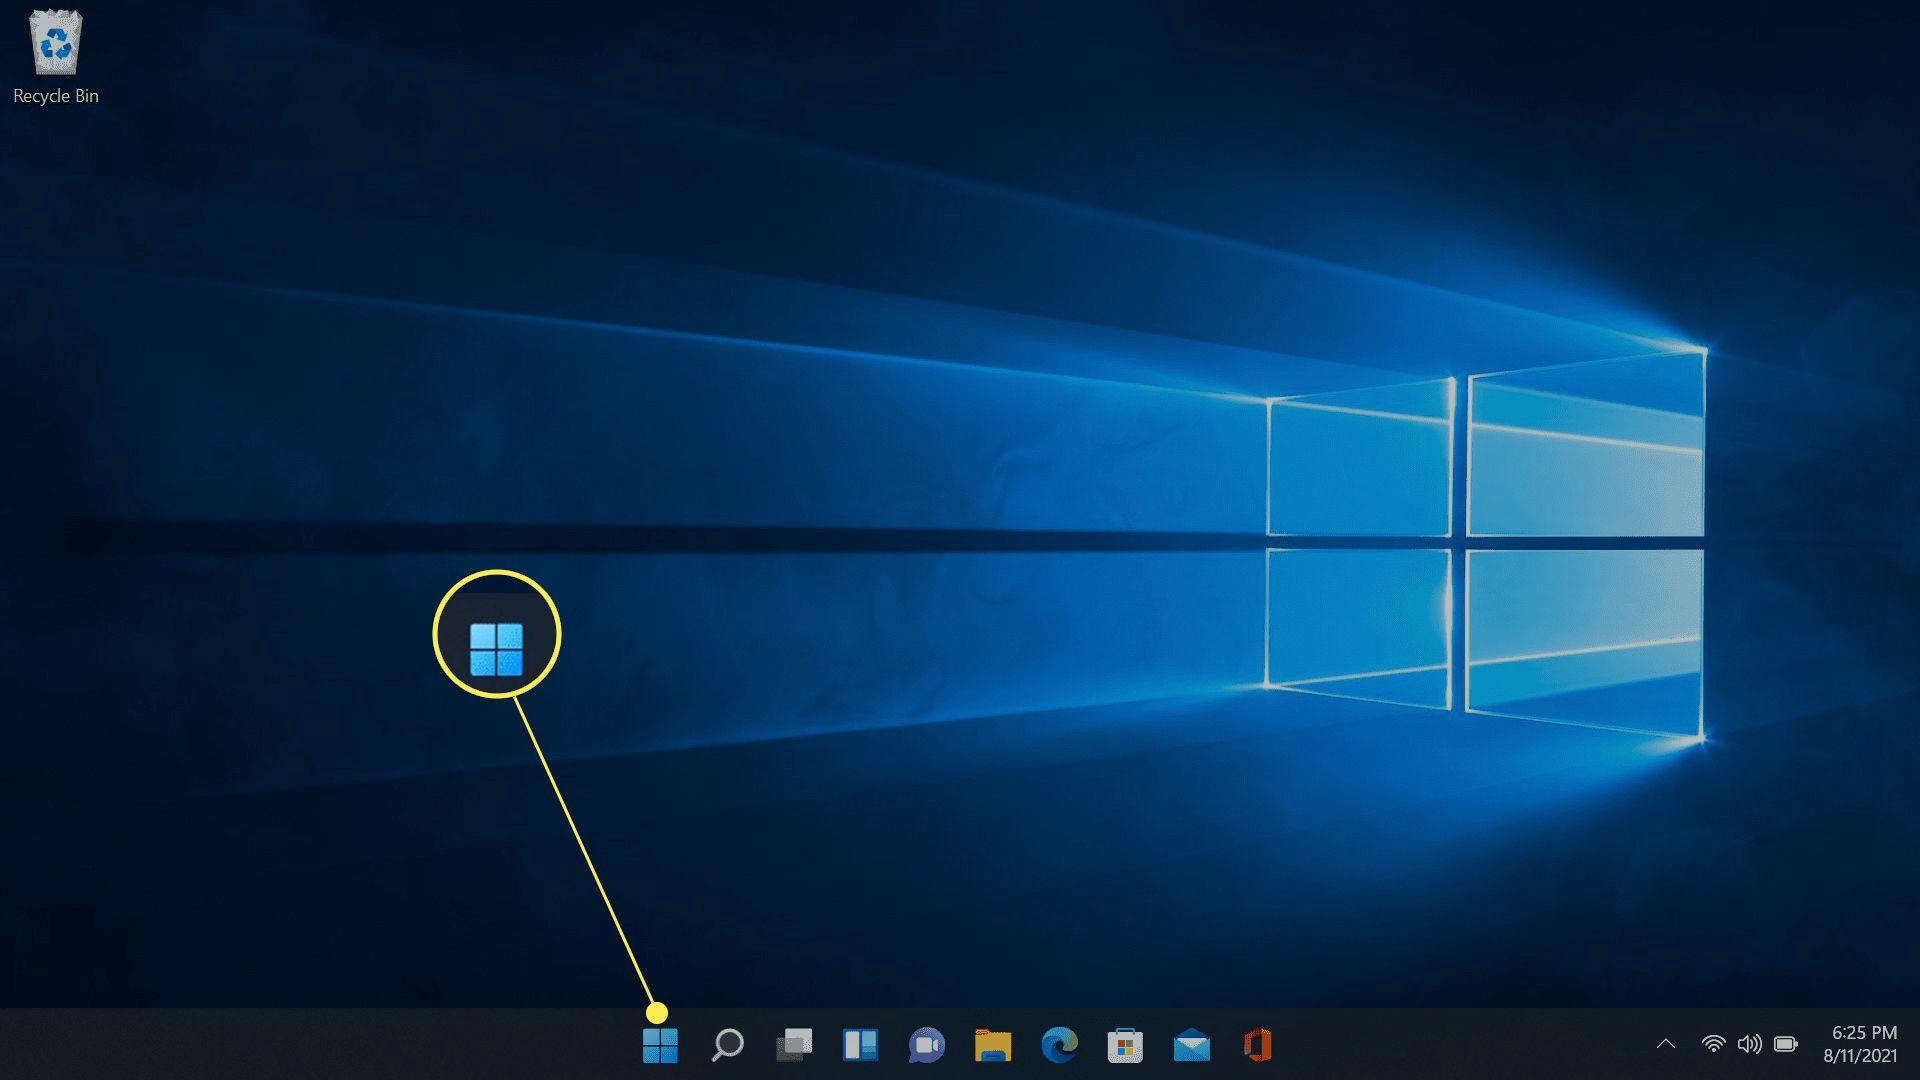 The Windows icon highlighted on the Windows 11 taskbar.